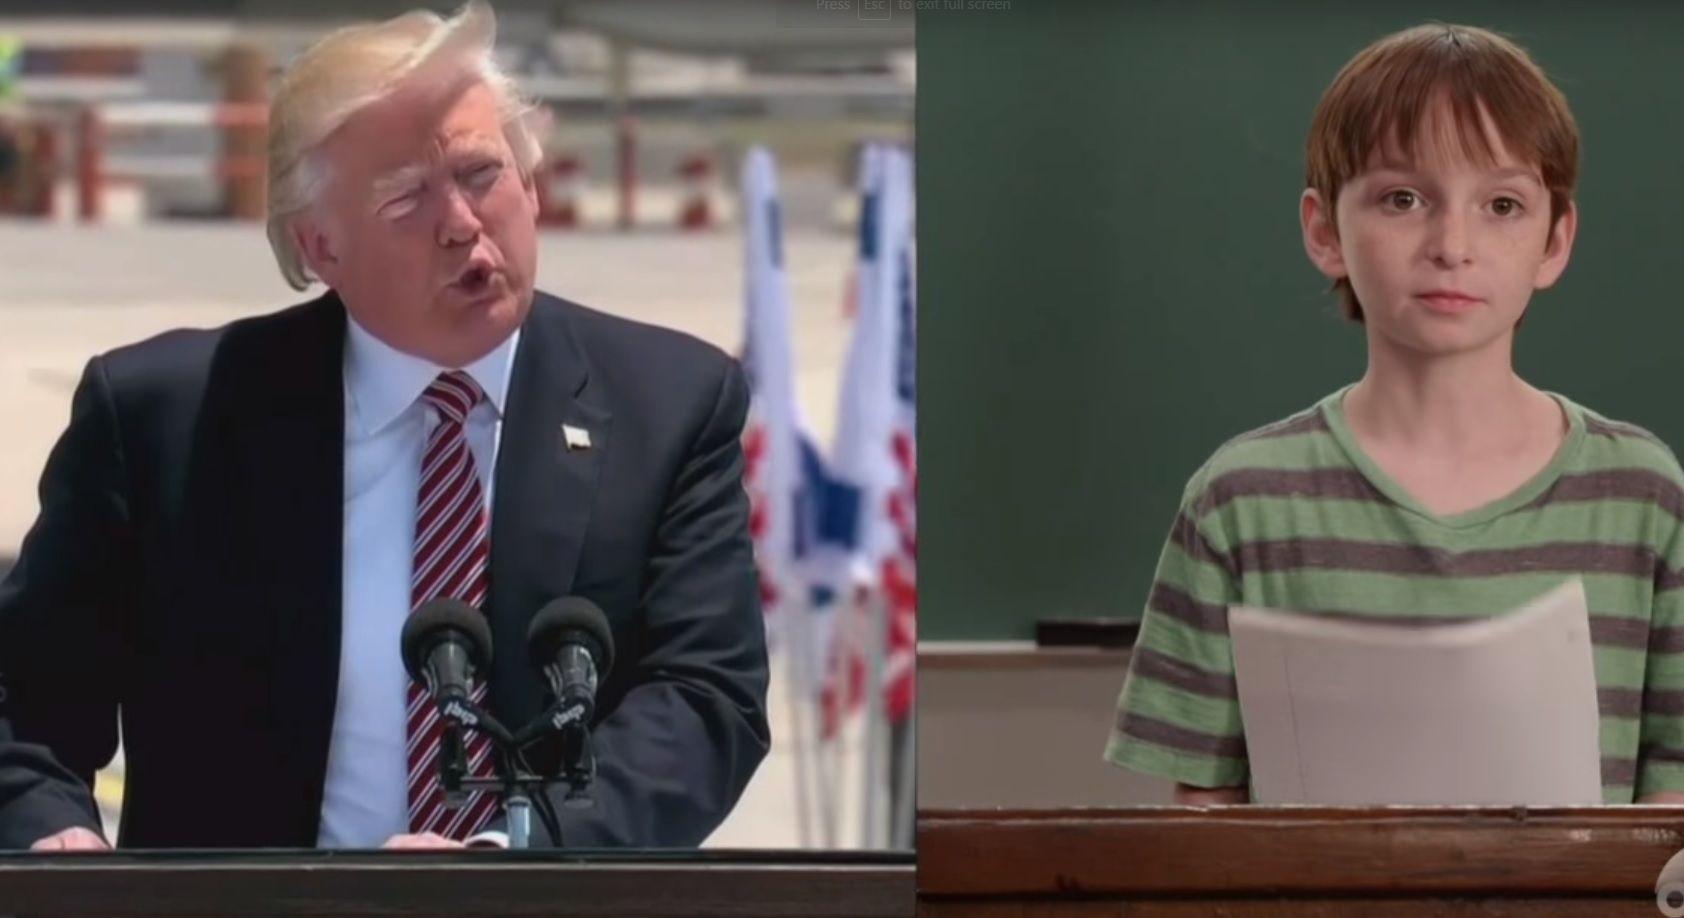 Kids read Trump's speeches